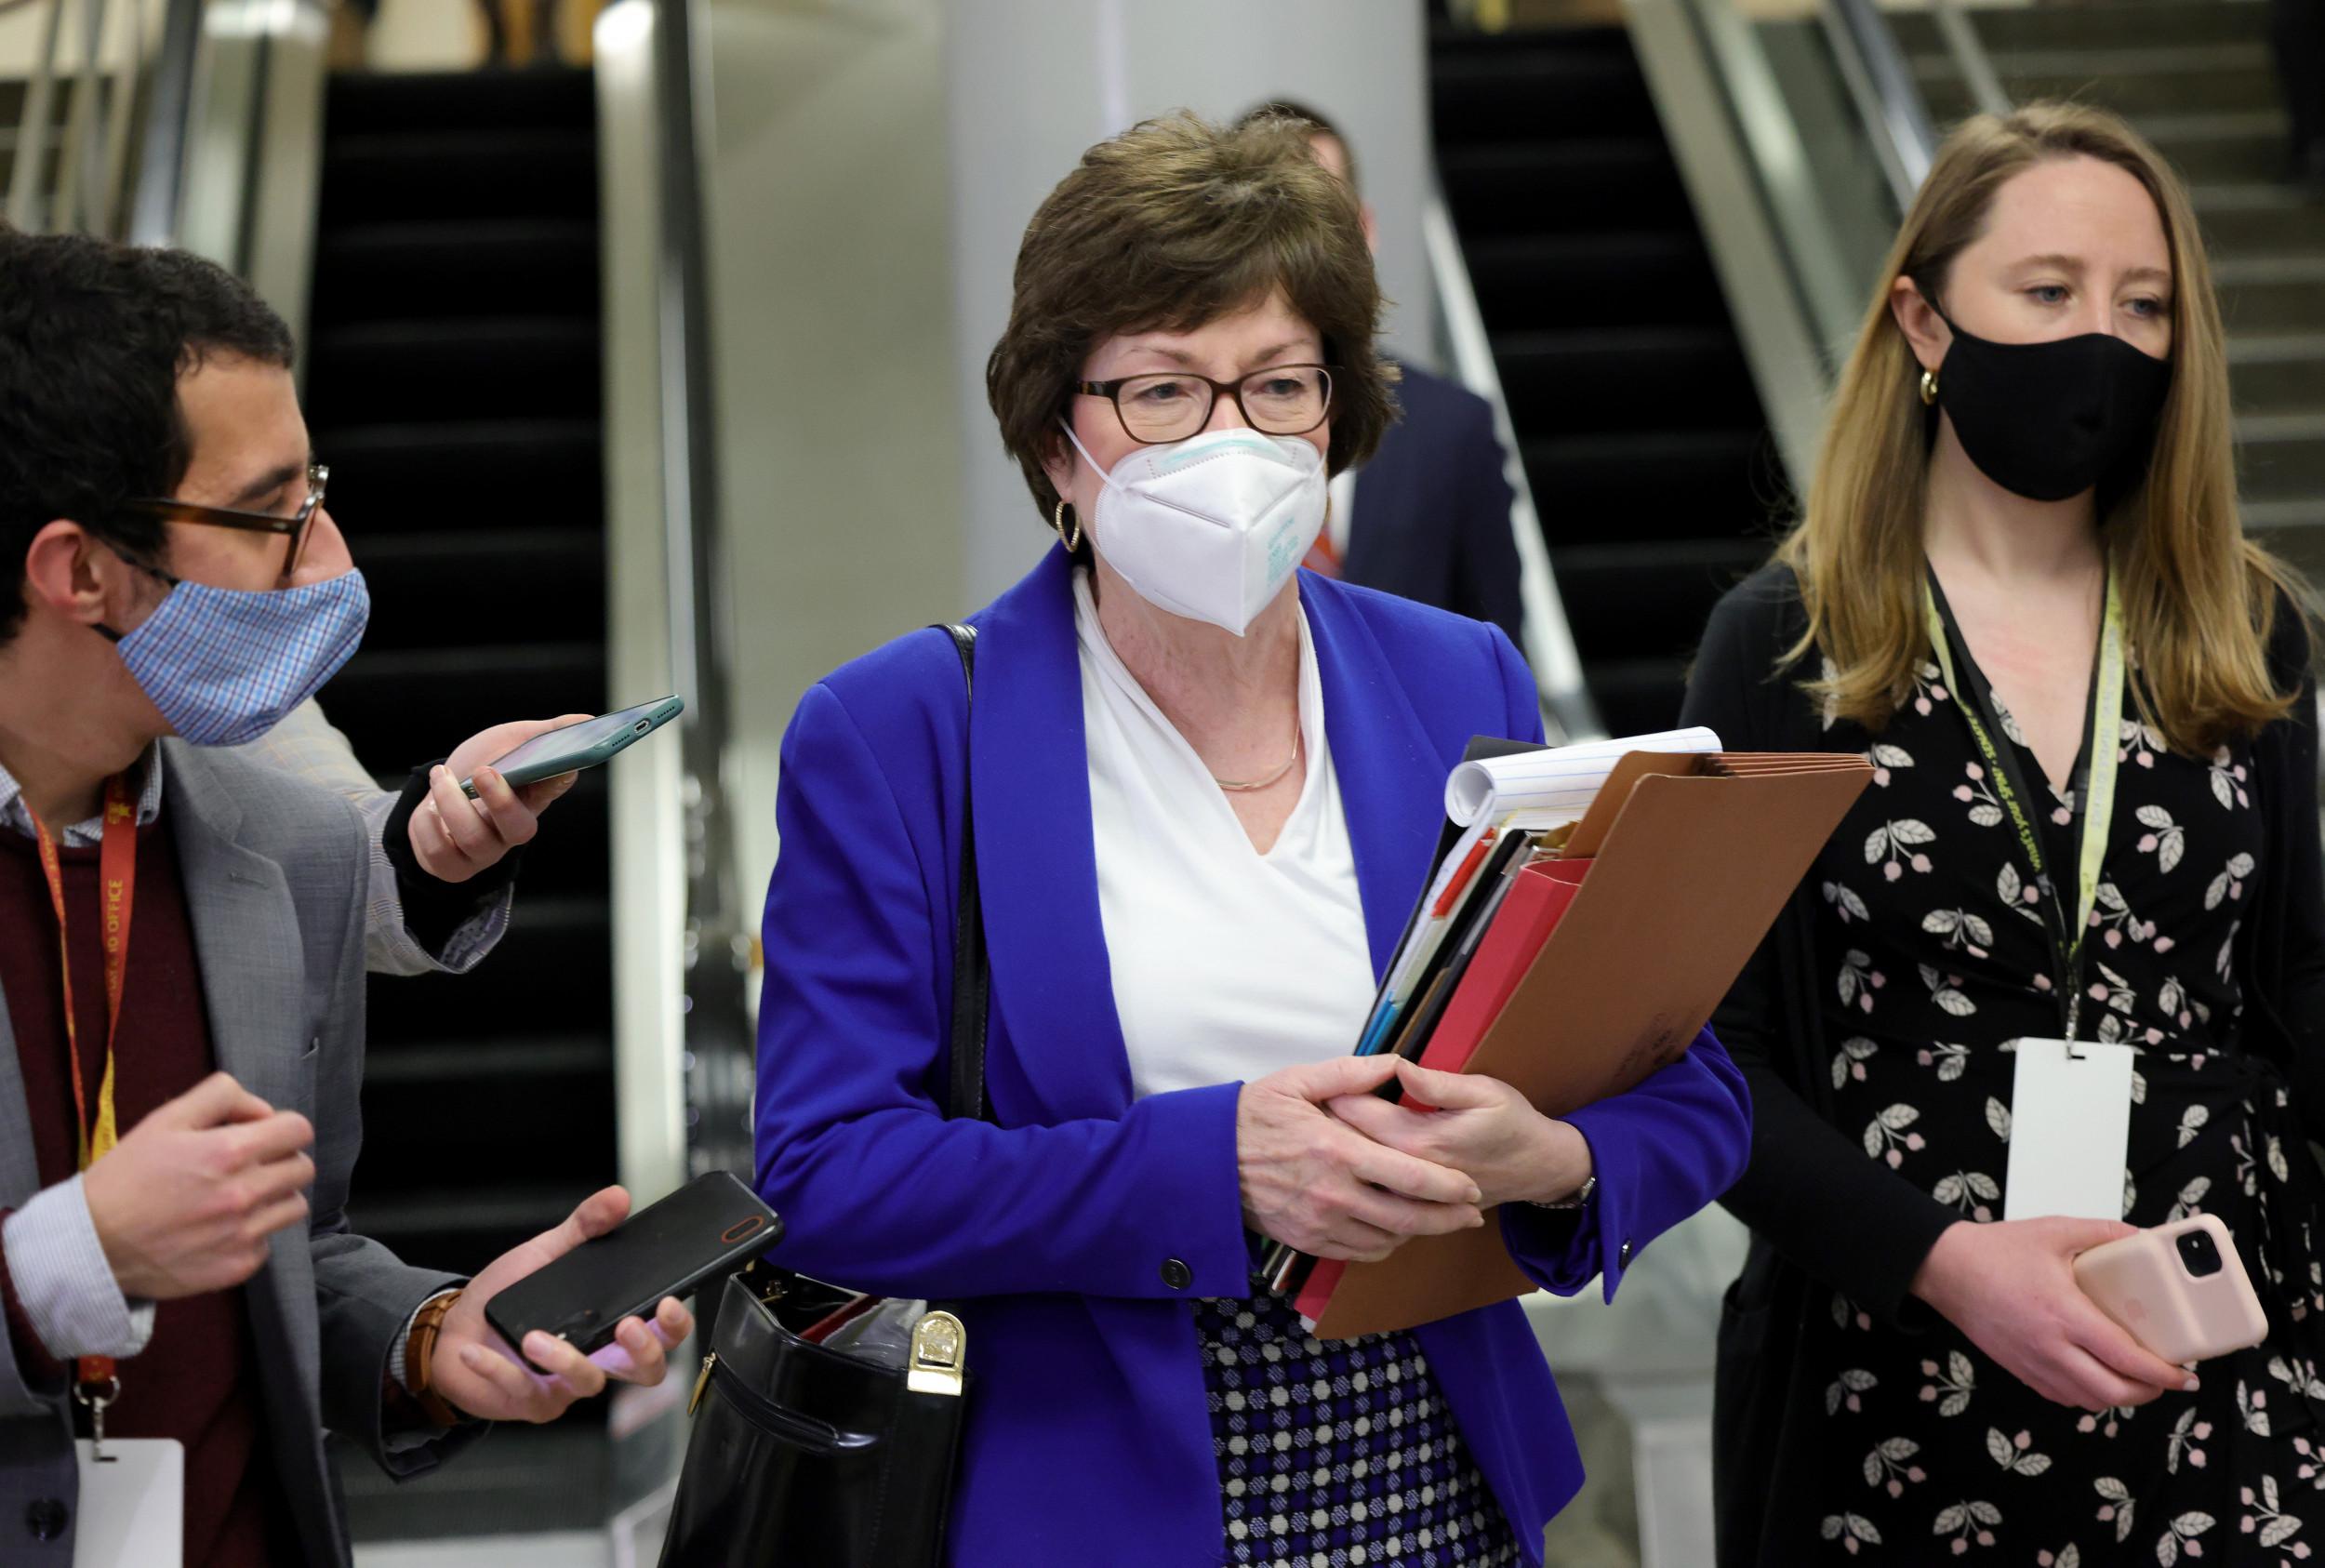 Susan Collins Criticizes Nancy Pelosi Over 'Partisan' Jan. 6 Committee